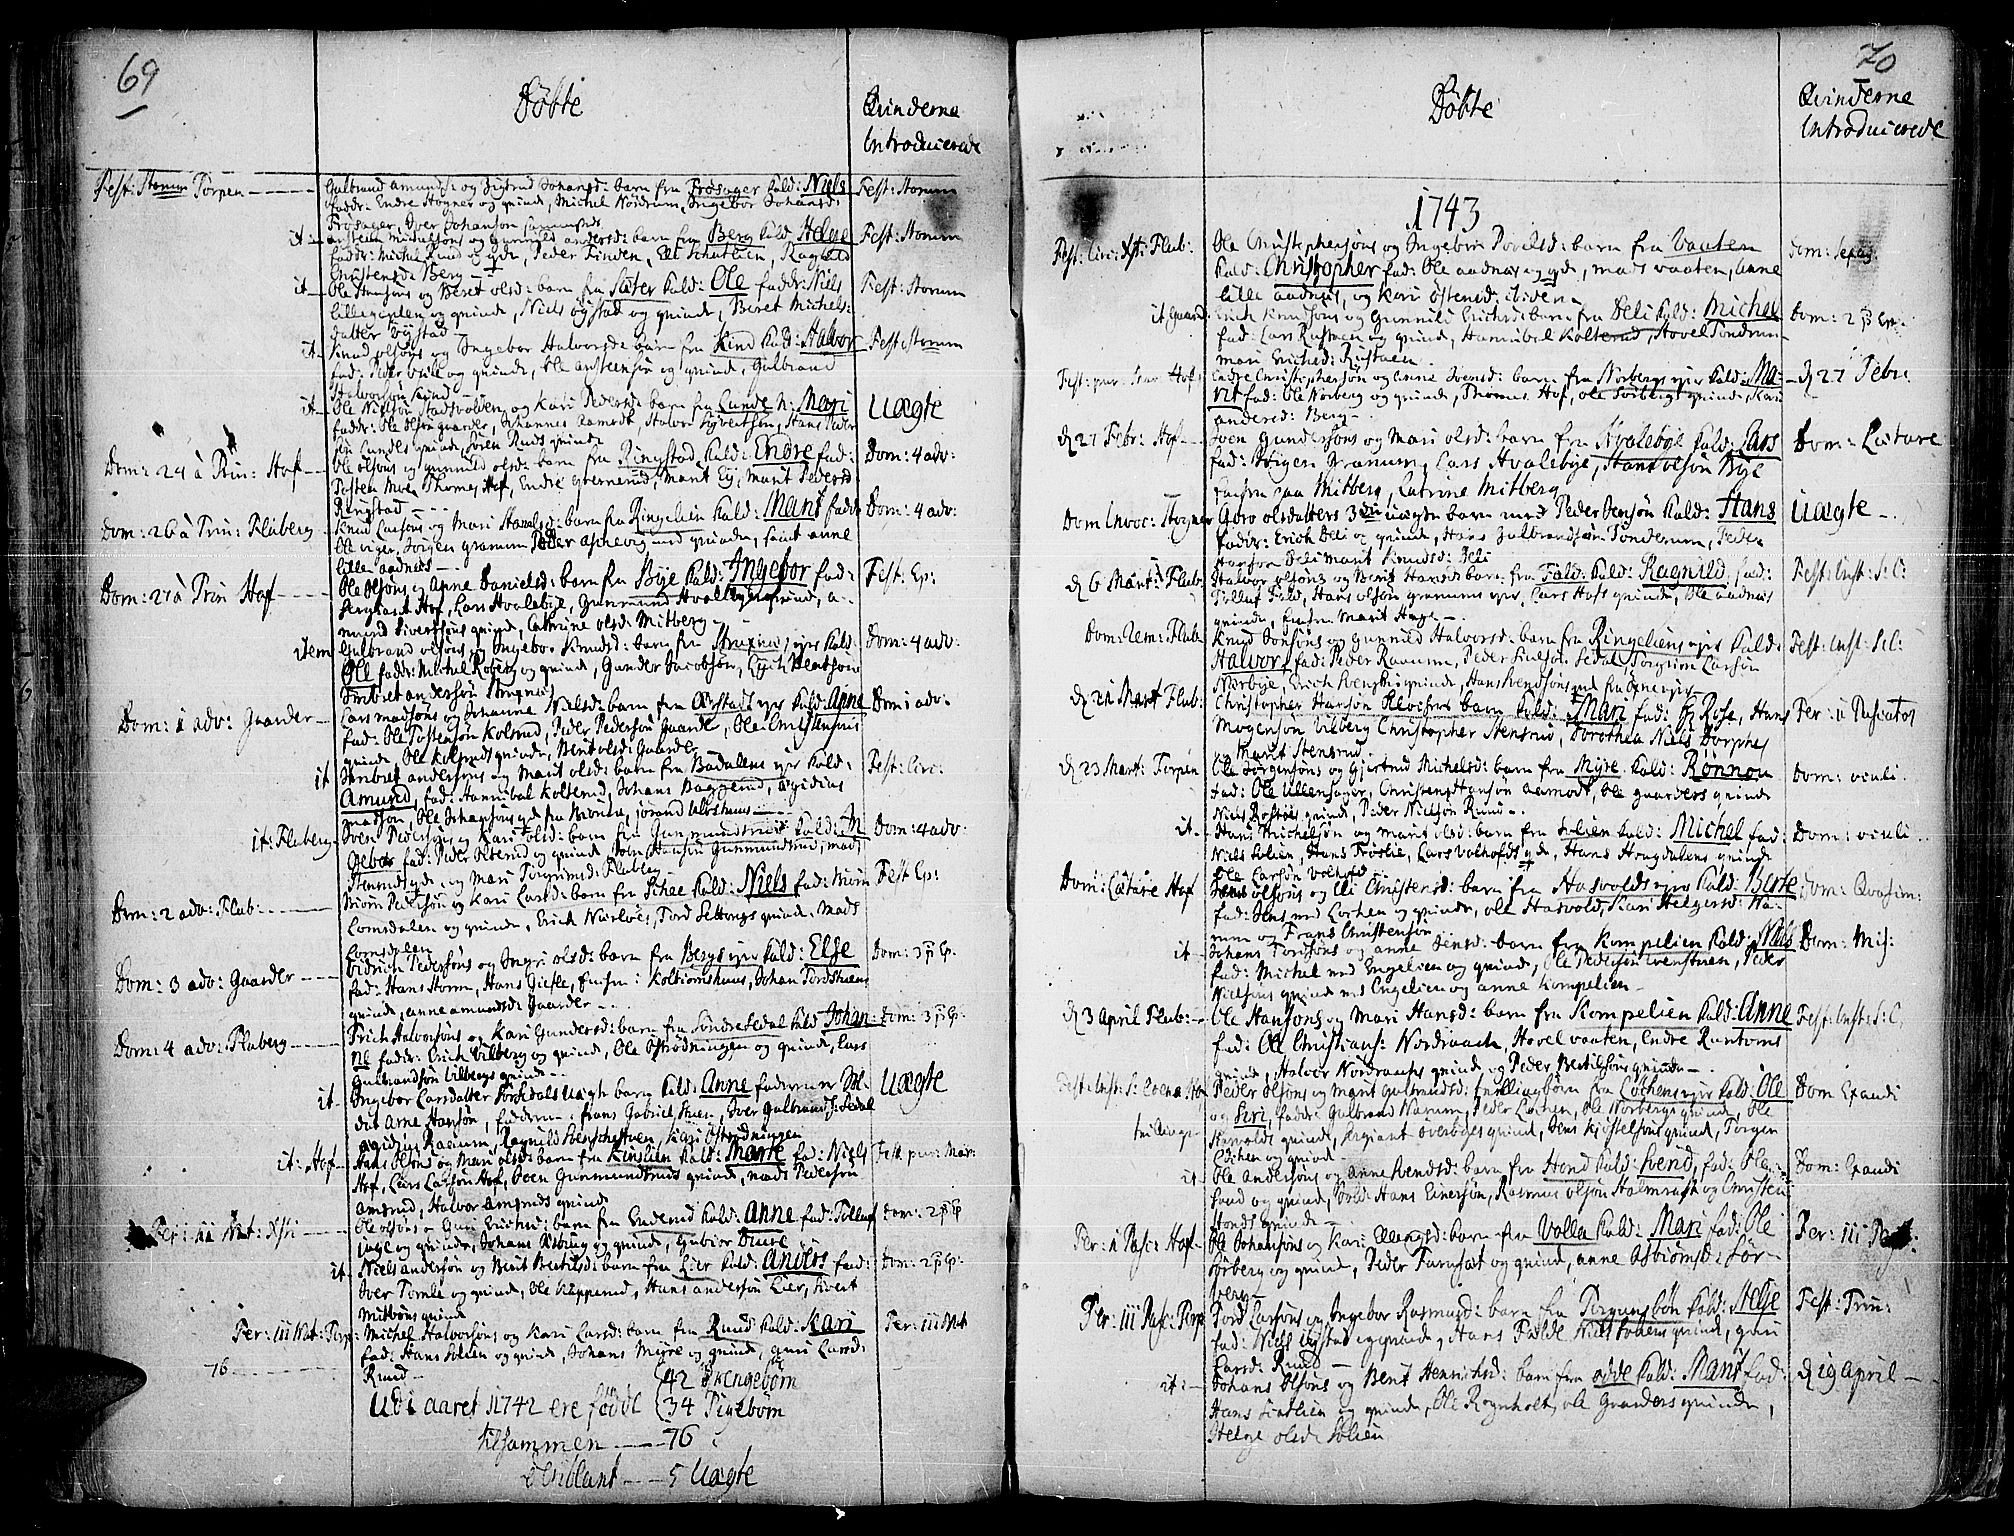 SAH, Land prestekontor, Ministerialbok nr. 2, 1733-1764, s. 69-70